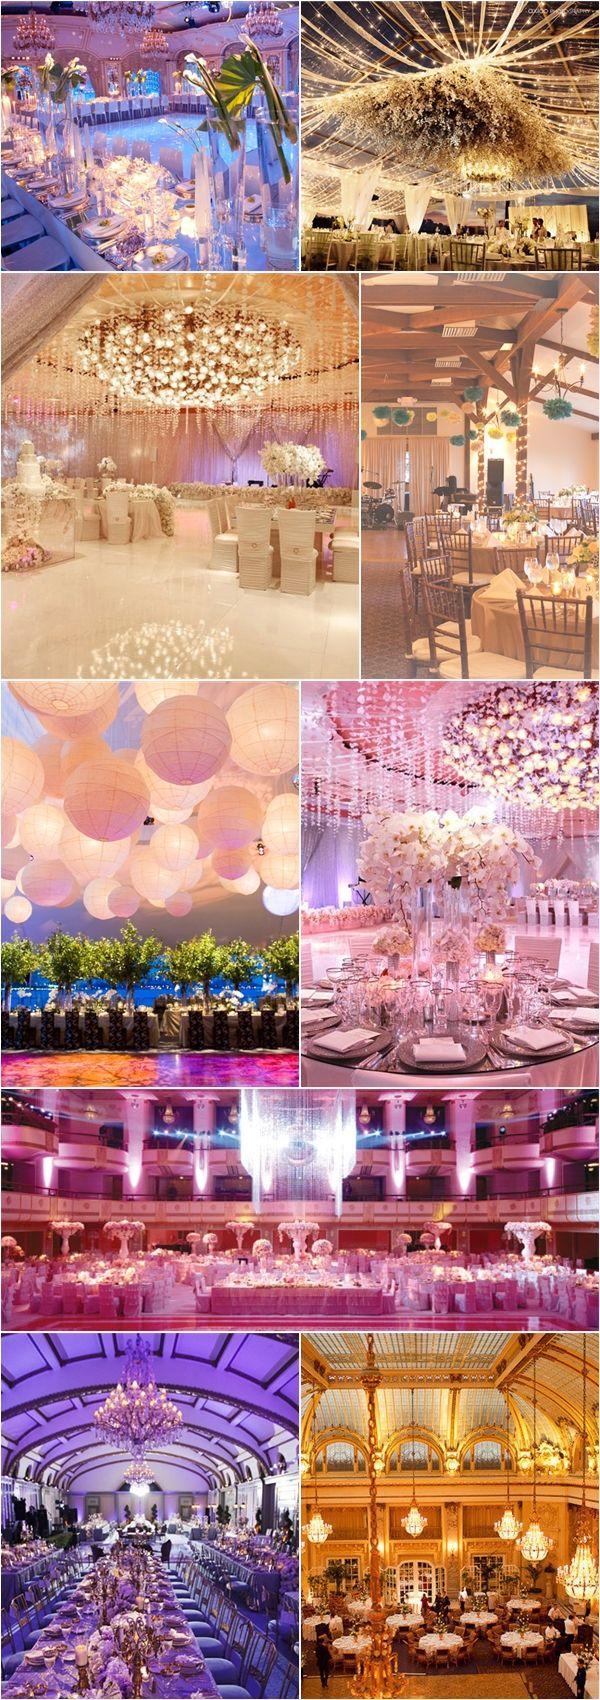 Wedding reception decoration images   Creative Reception Decoration Ideas  Reception Wedding and